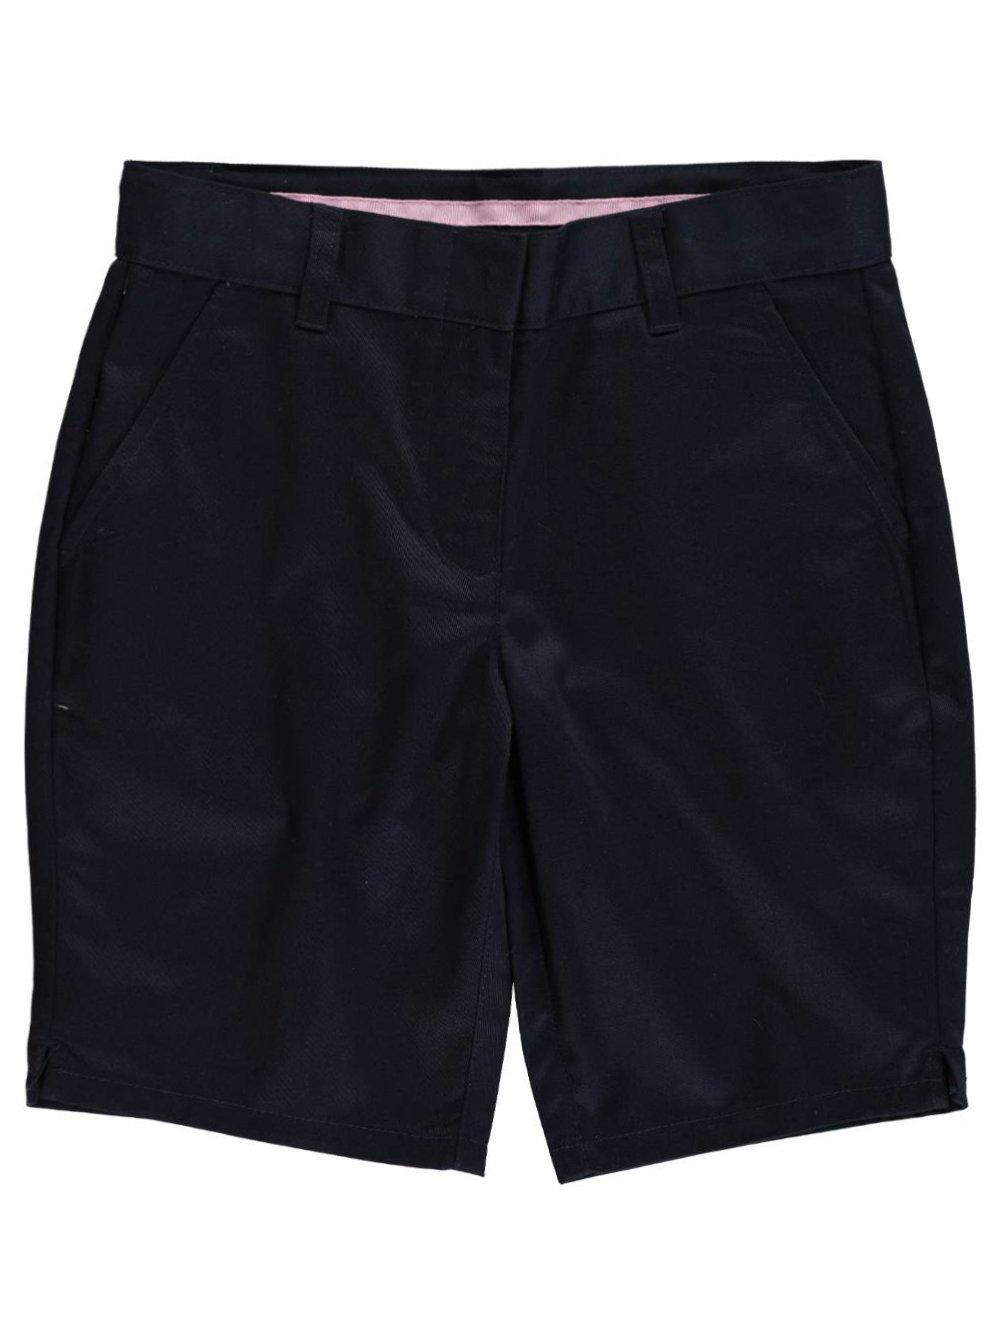 Universal Big Girls' Flat Front Shorts